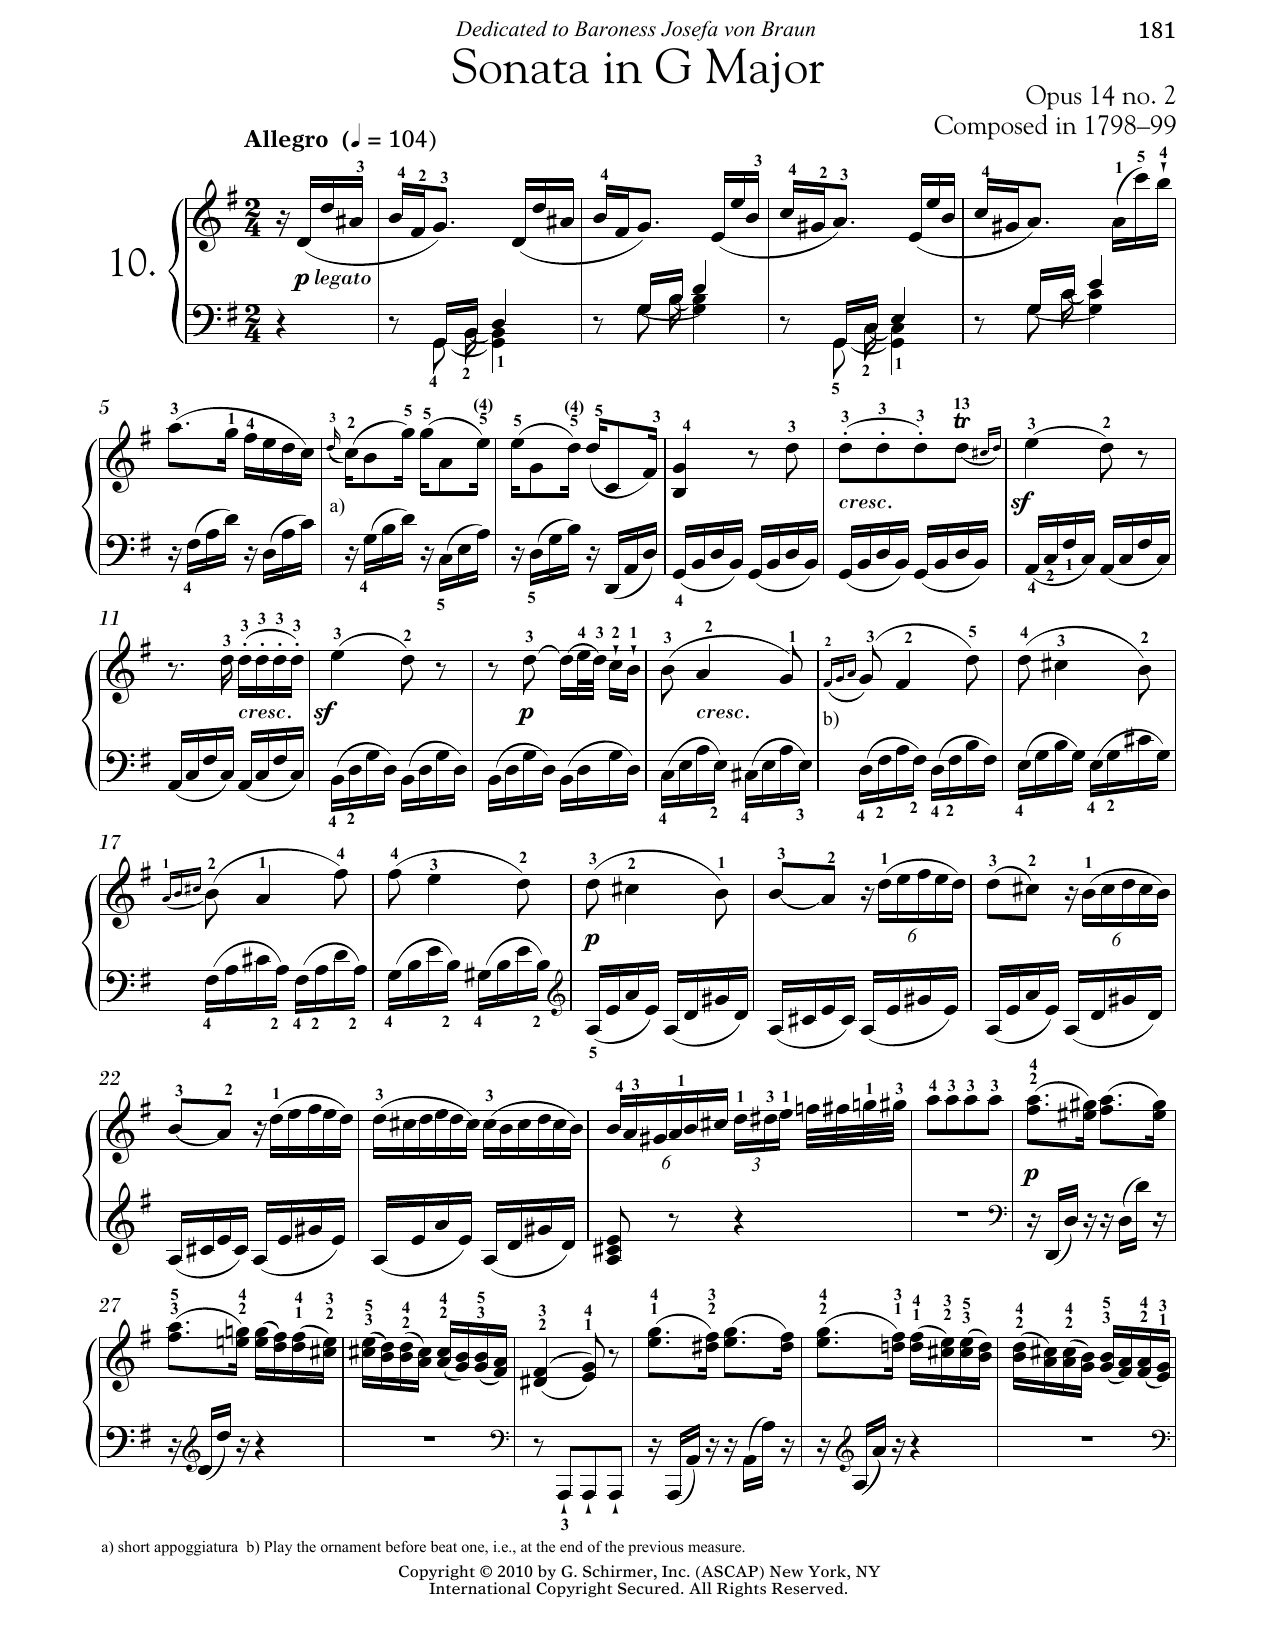 Download Ludwig van Beethoven 'Piano Sonata No. 10 In G Major, Op. 14, No. 2' Digital Sheet Music Notes & Chords and start playing in minutes